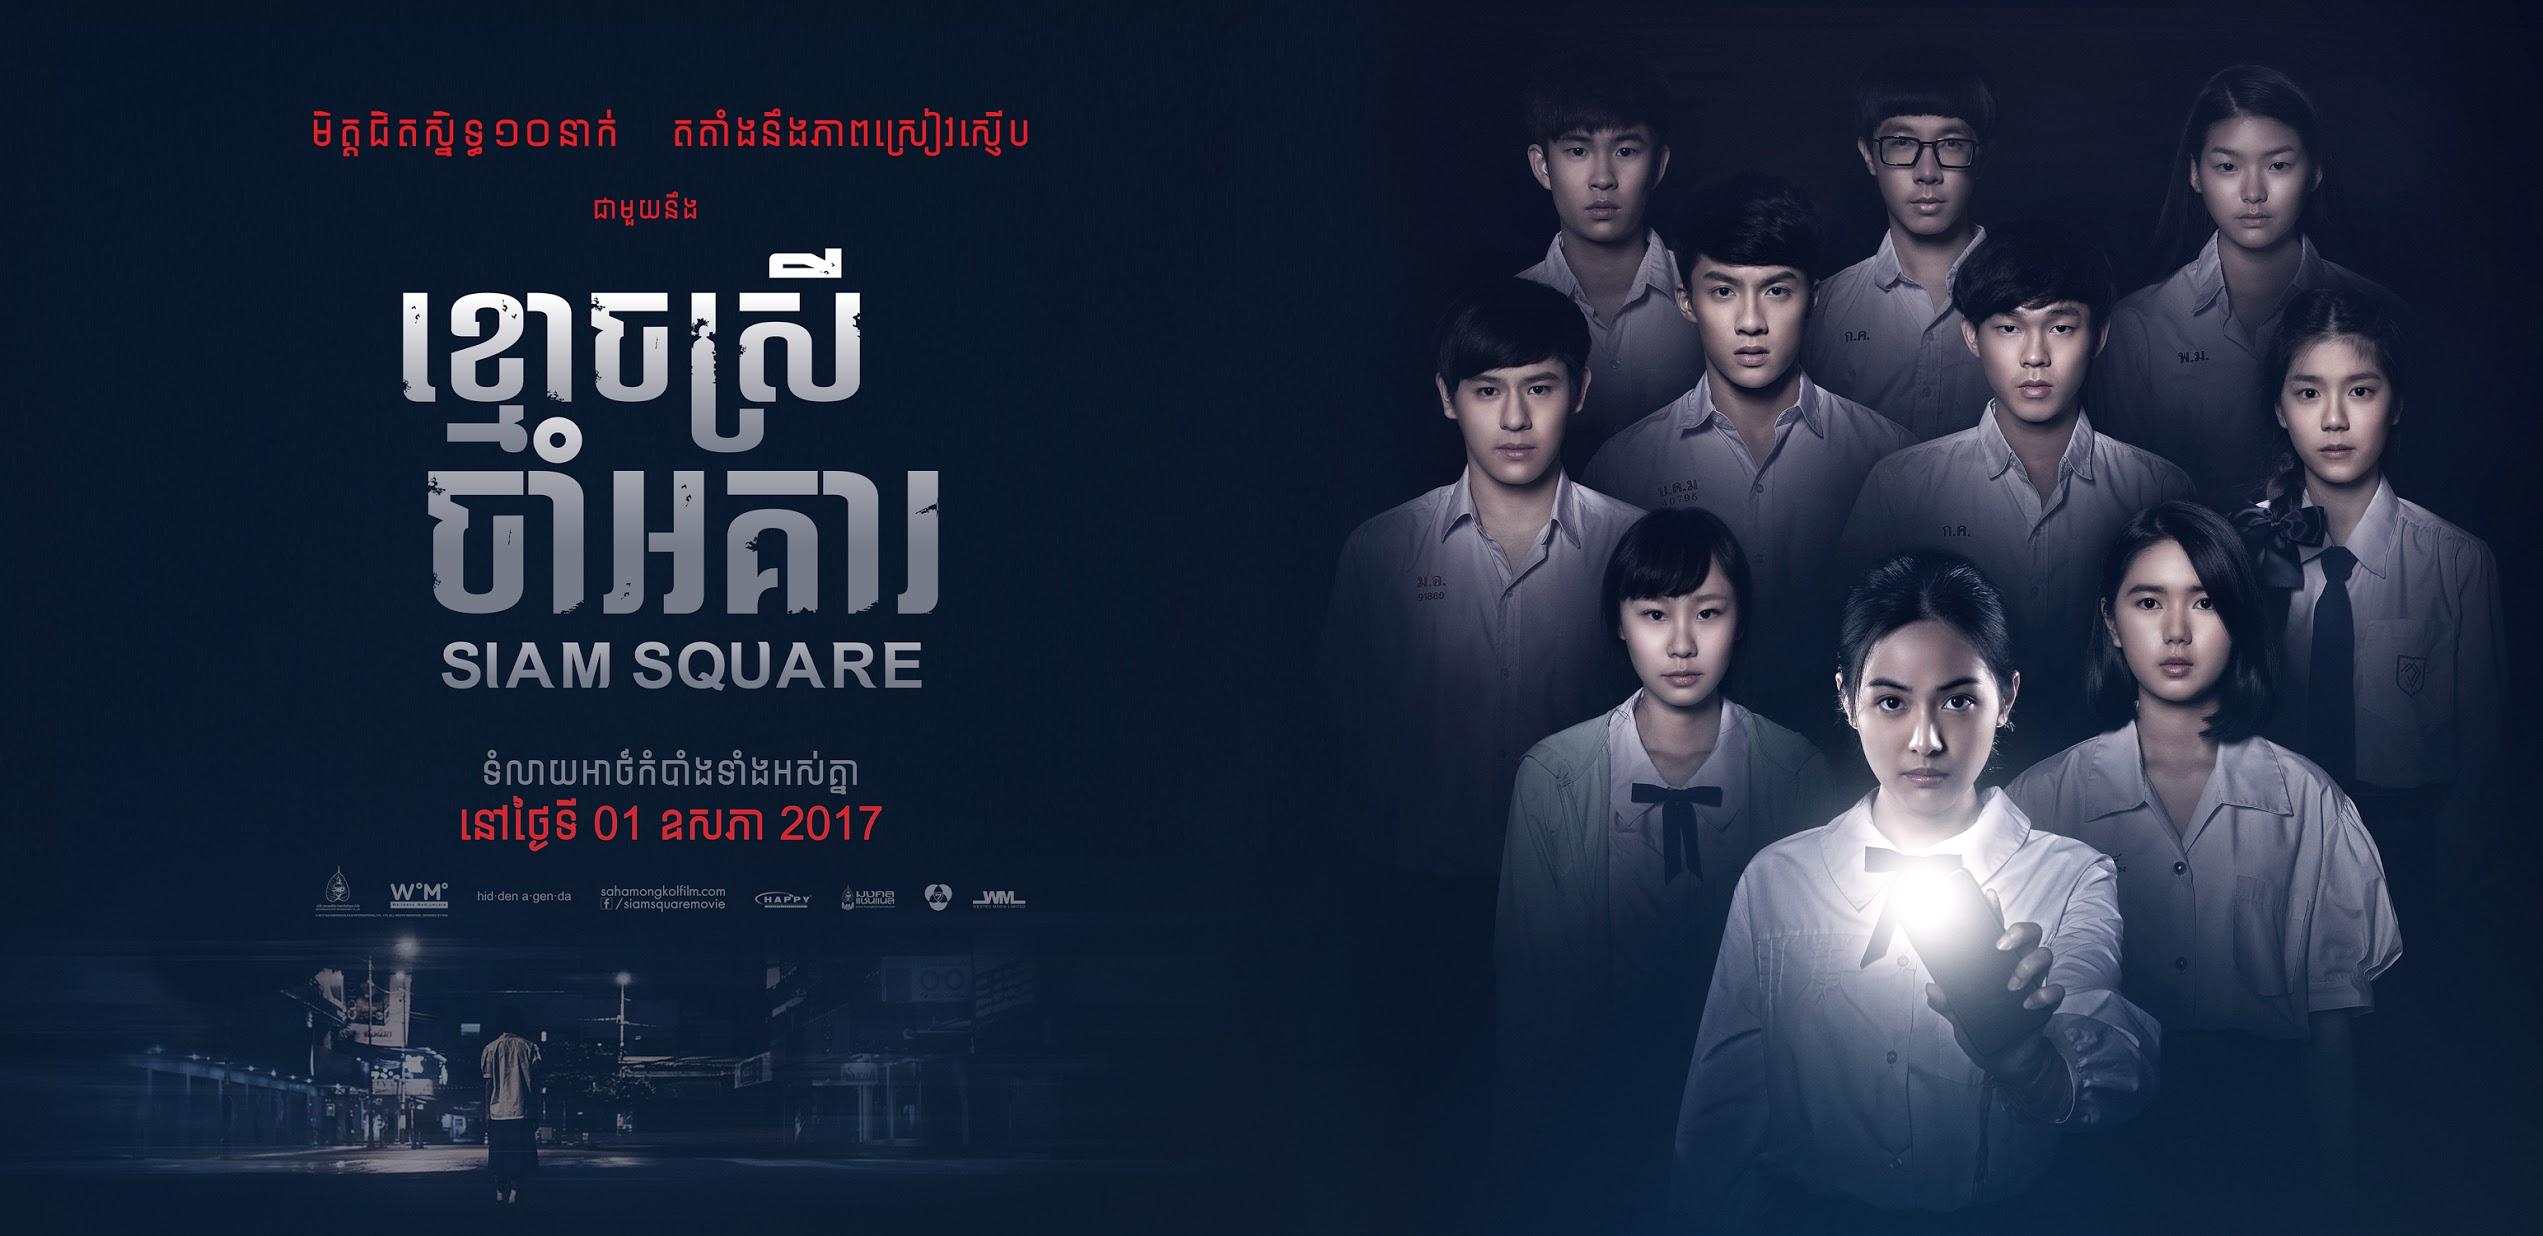 Siam Square 2017 Full Movie With English Subtitle